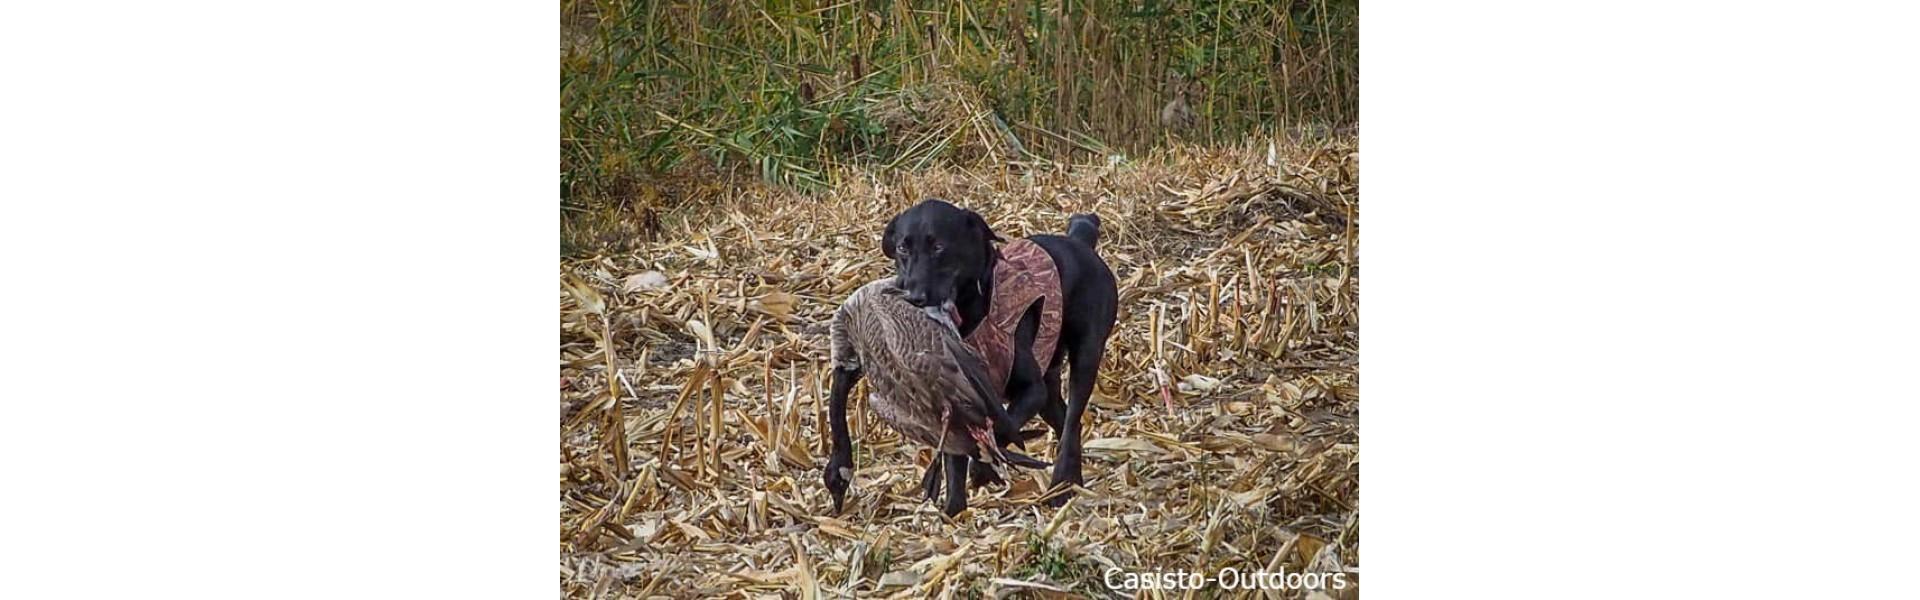 Labrador et bernache